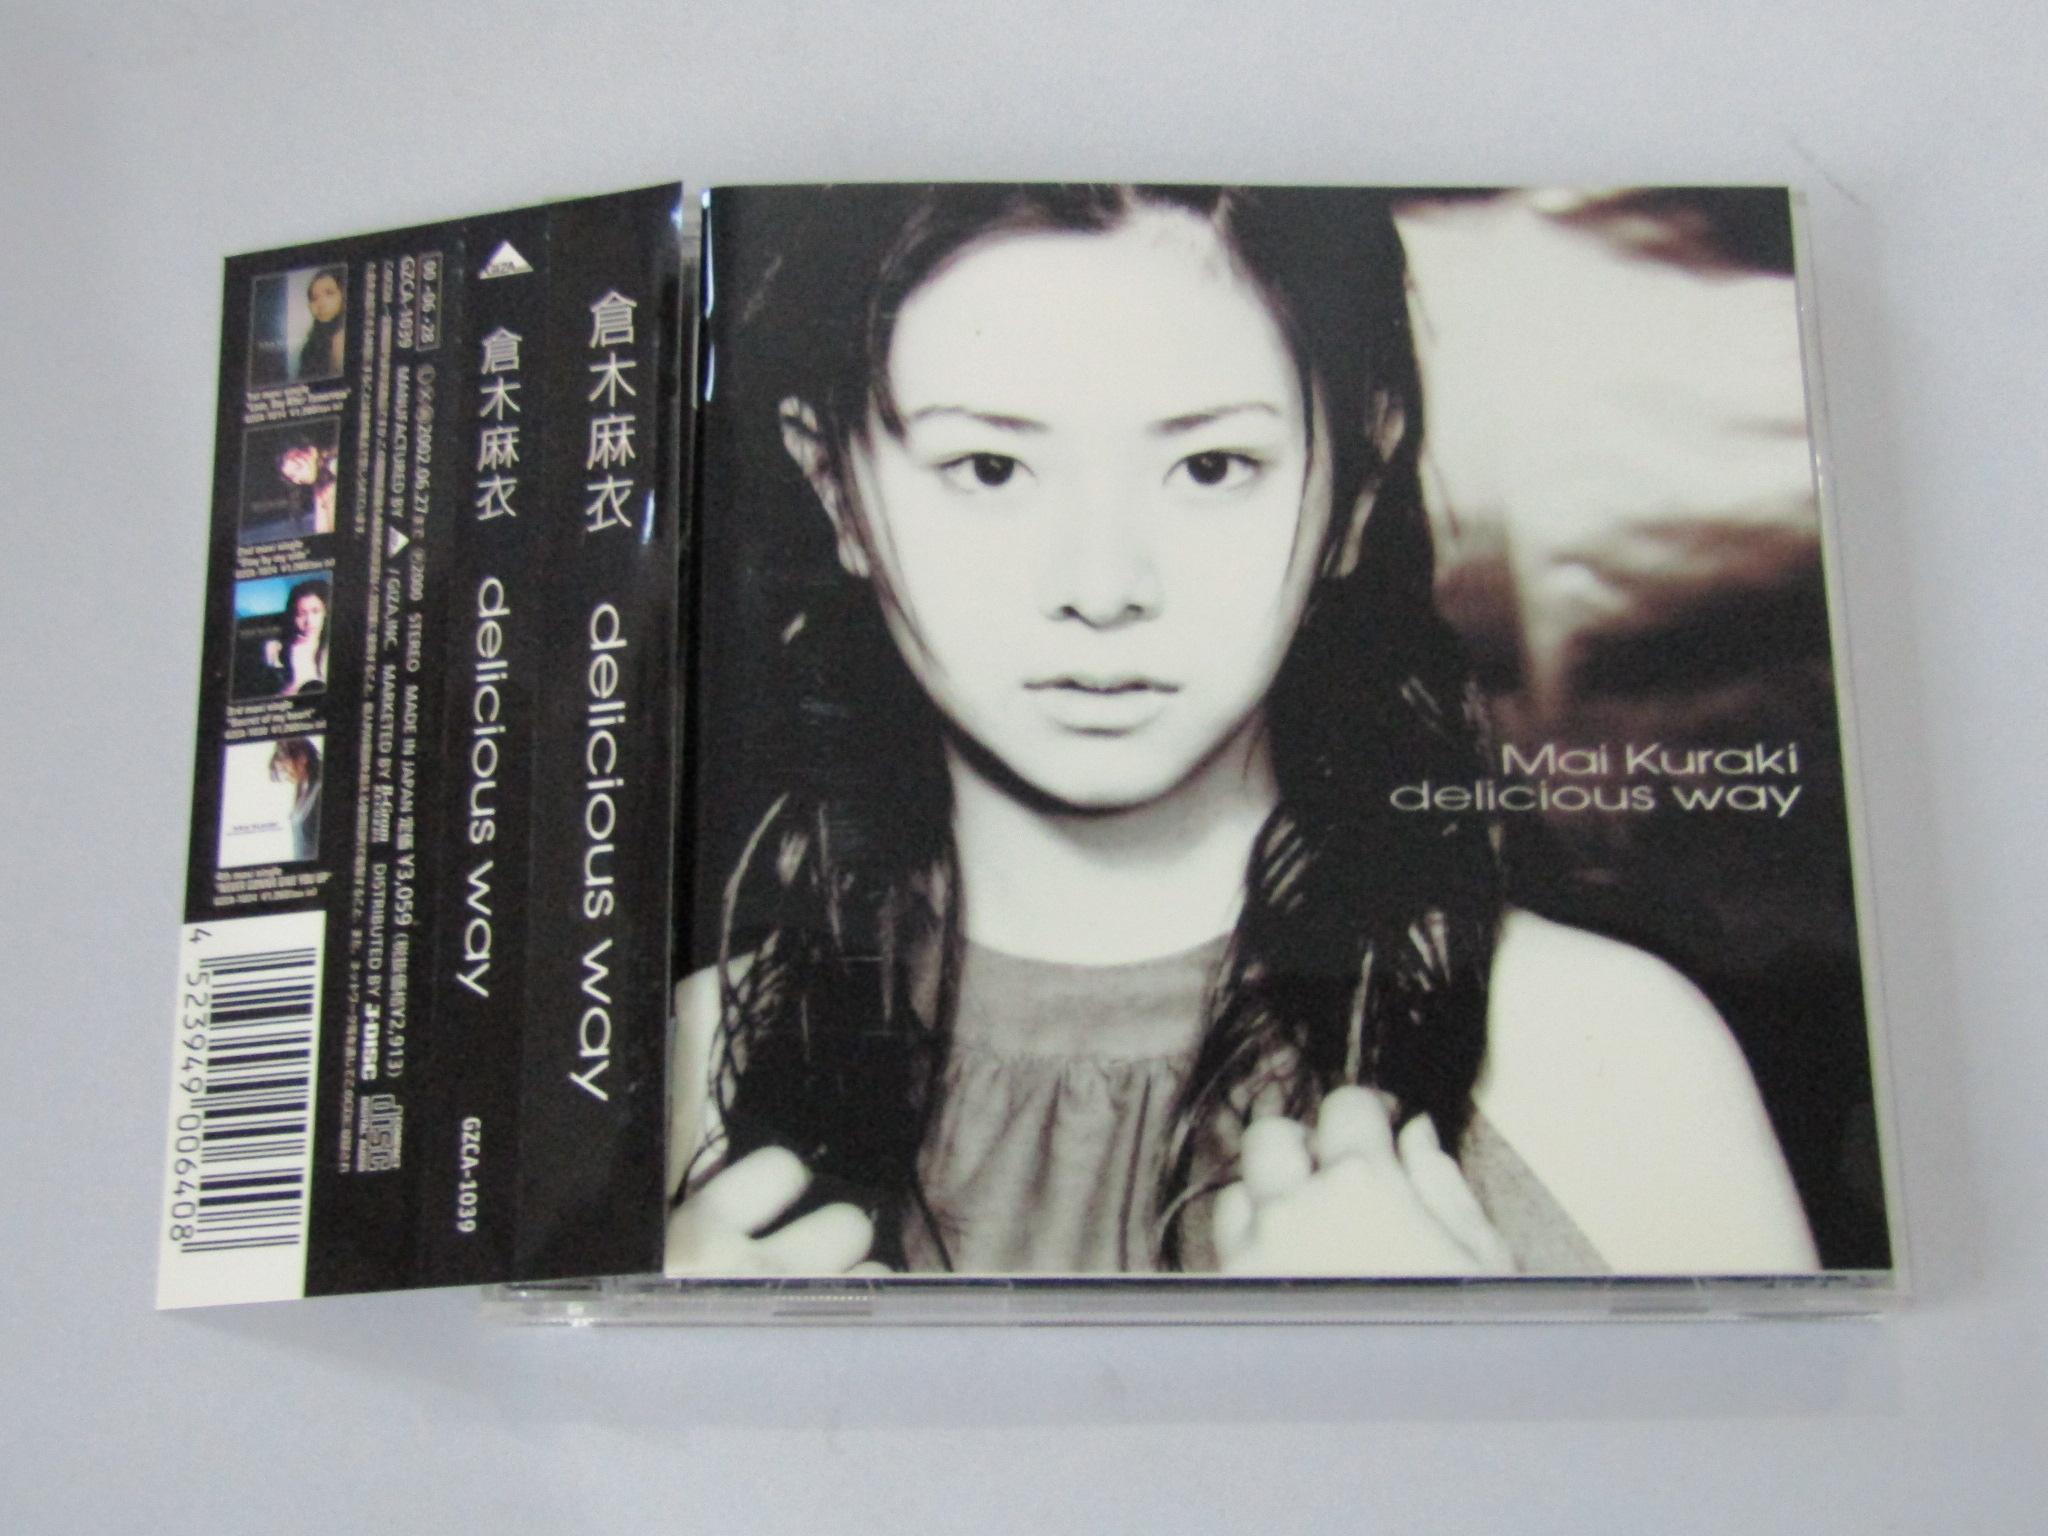 Mai Kuraki deliciousway Mai Kuraki, opened Z144 version